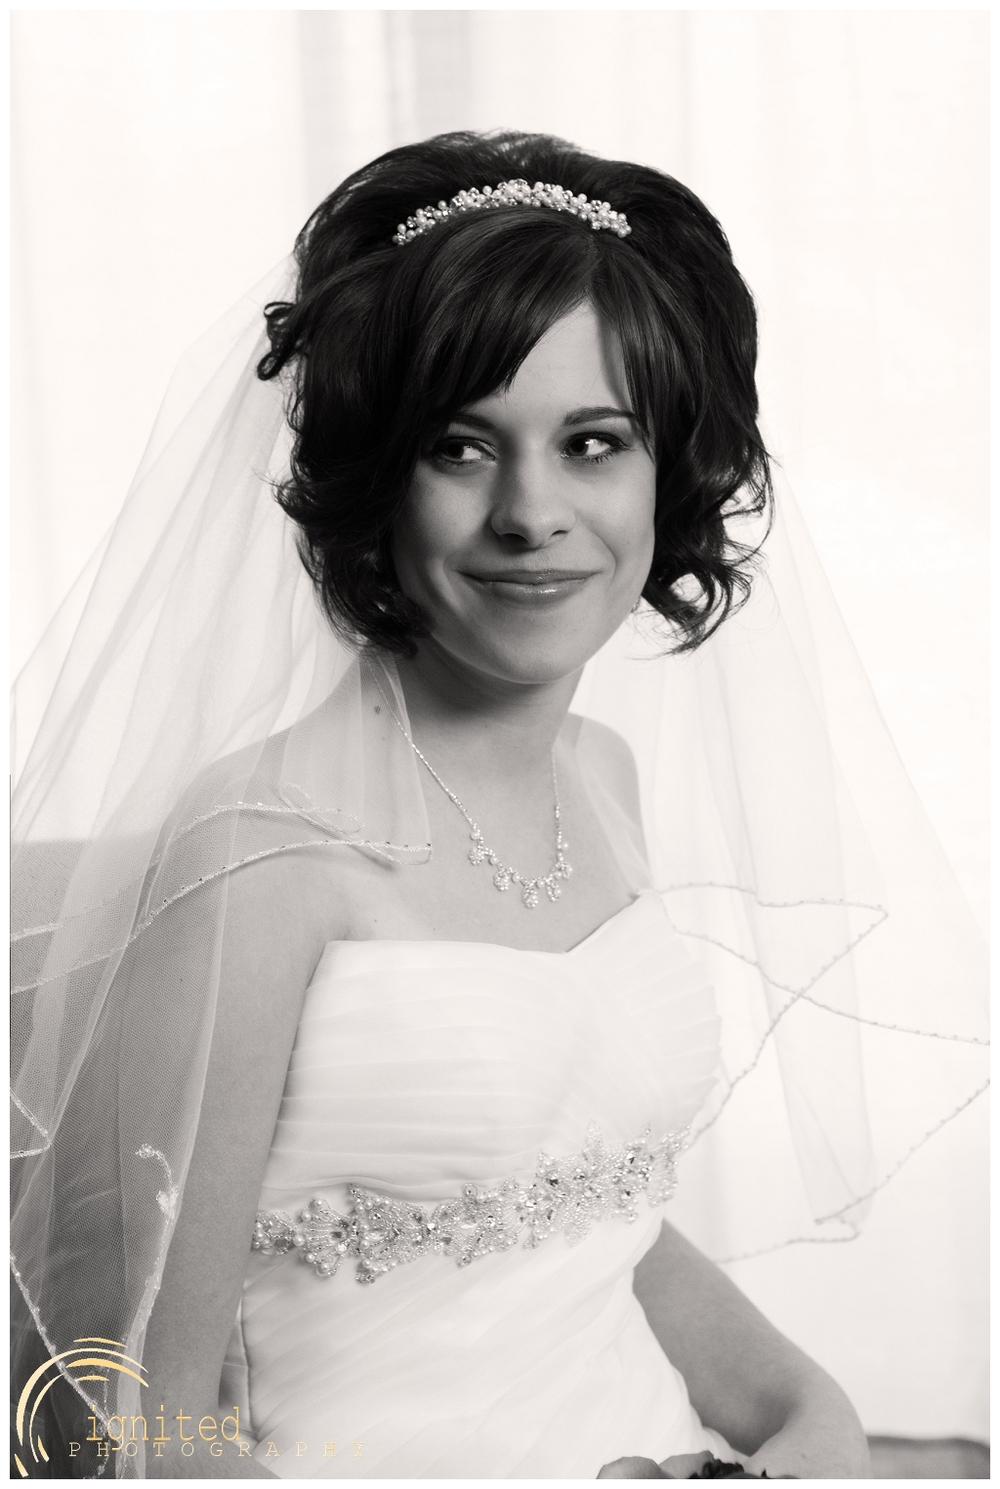 ignited Photography Alyssa  Castwell and Caleb Merna Wedding Brighton Nazarene The Naz Howell MI_0025.jpg